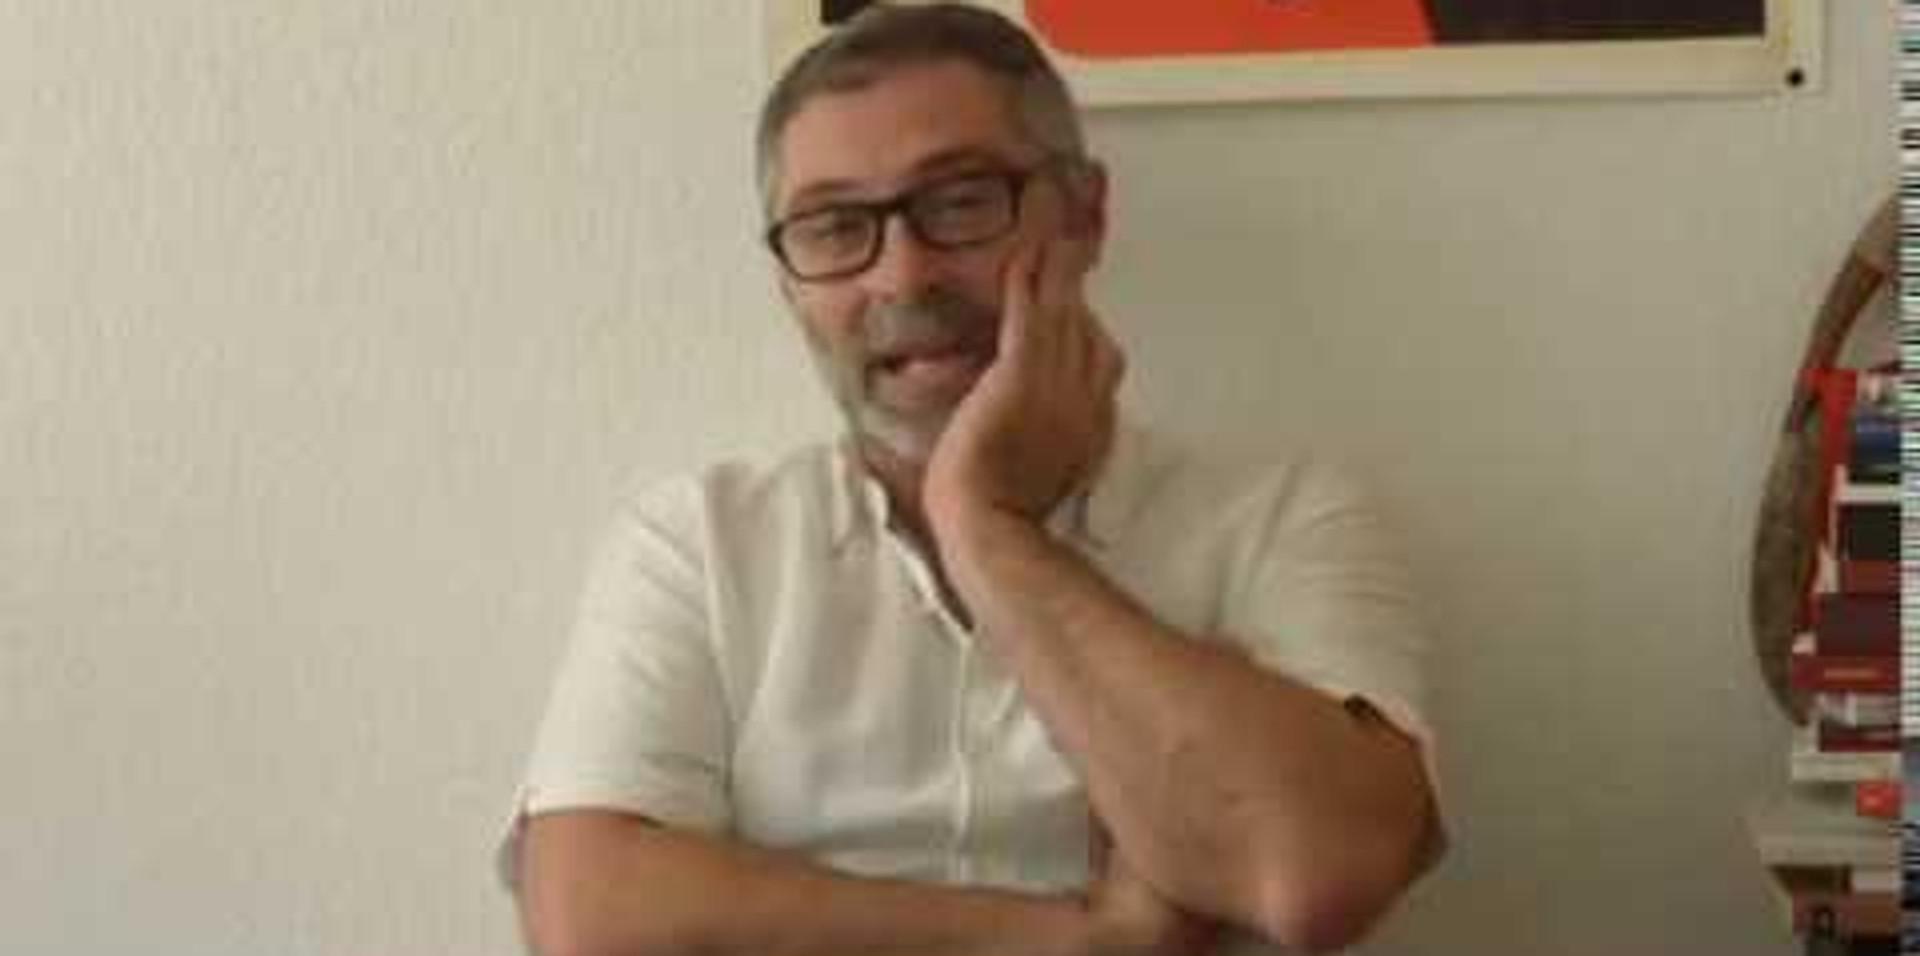 Entrevista a Massimo Modonesi sobre la realidad latinoamericana